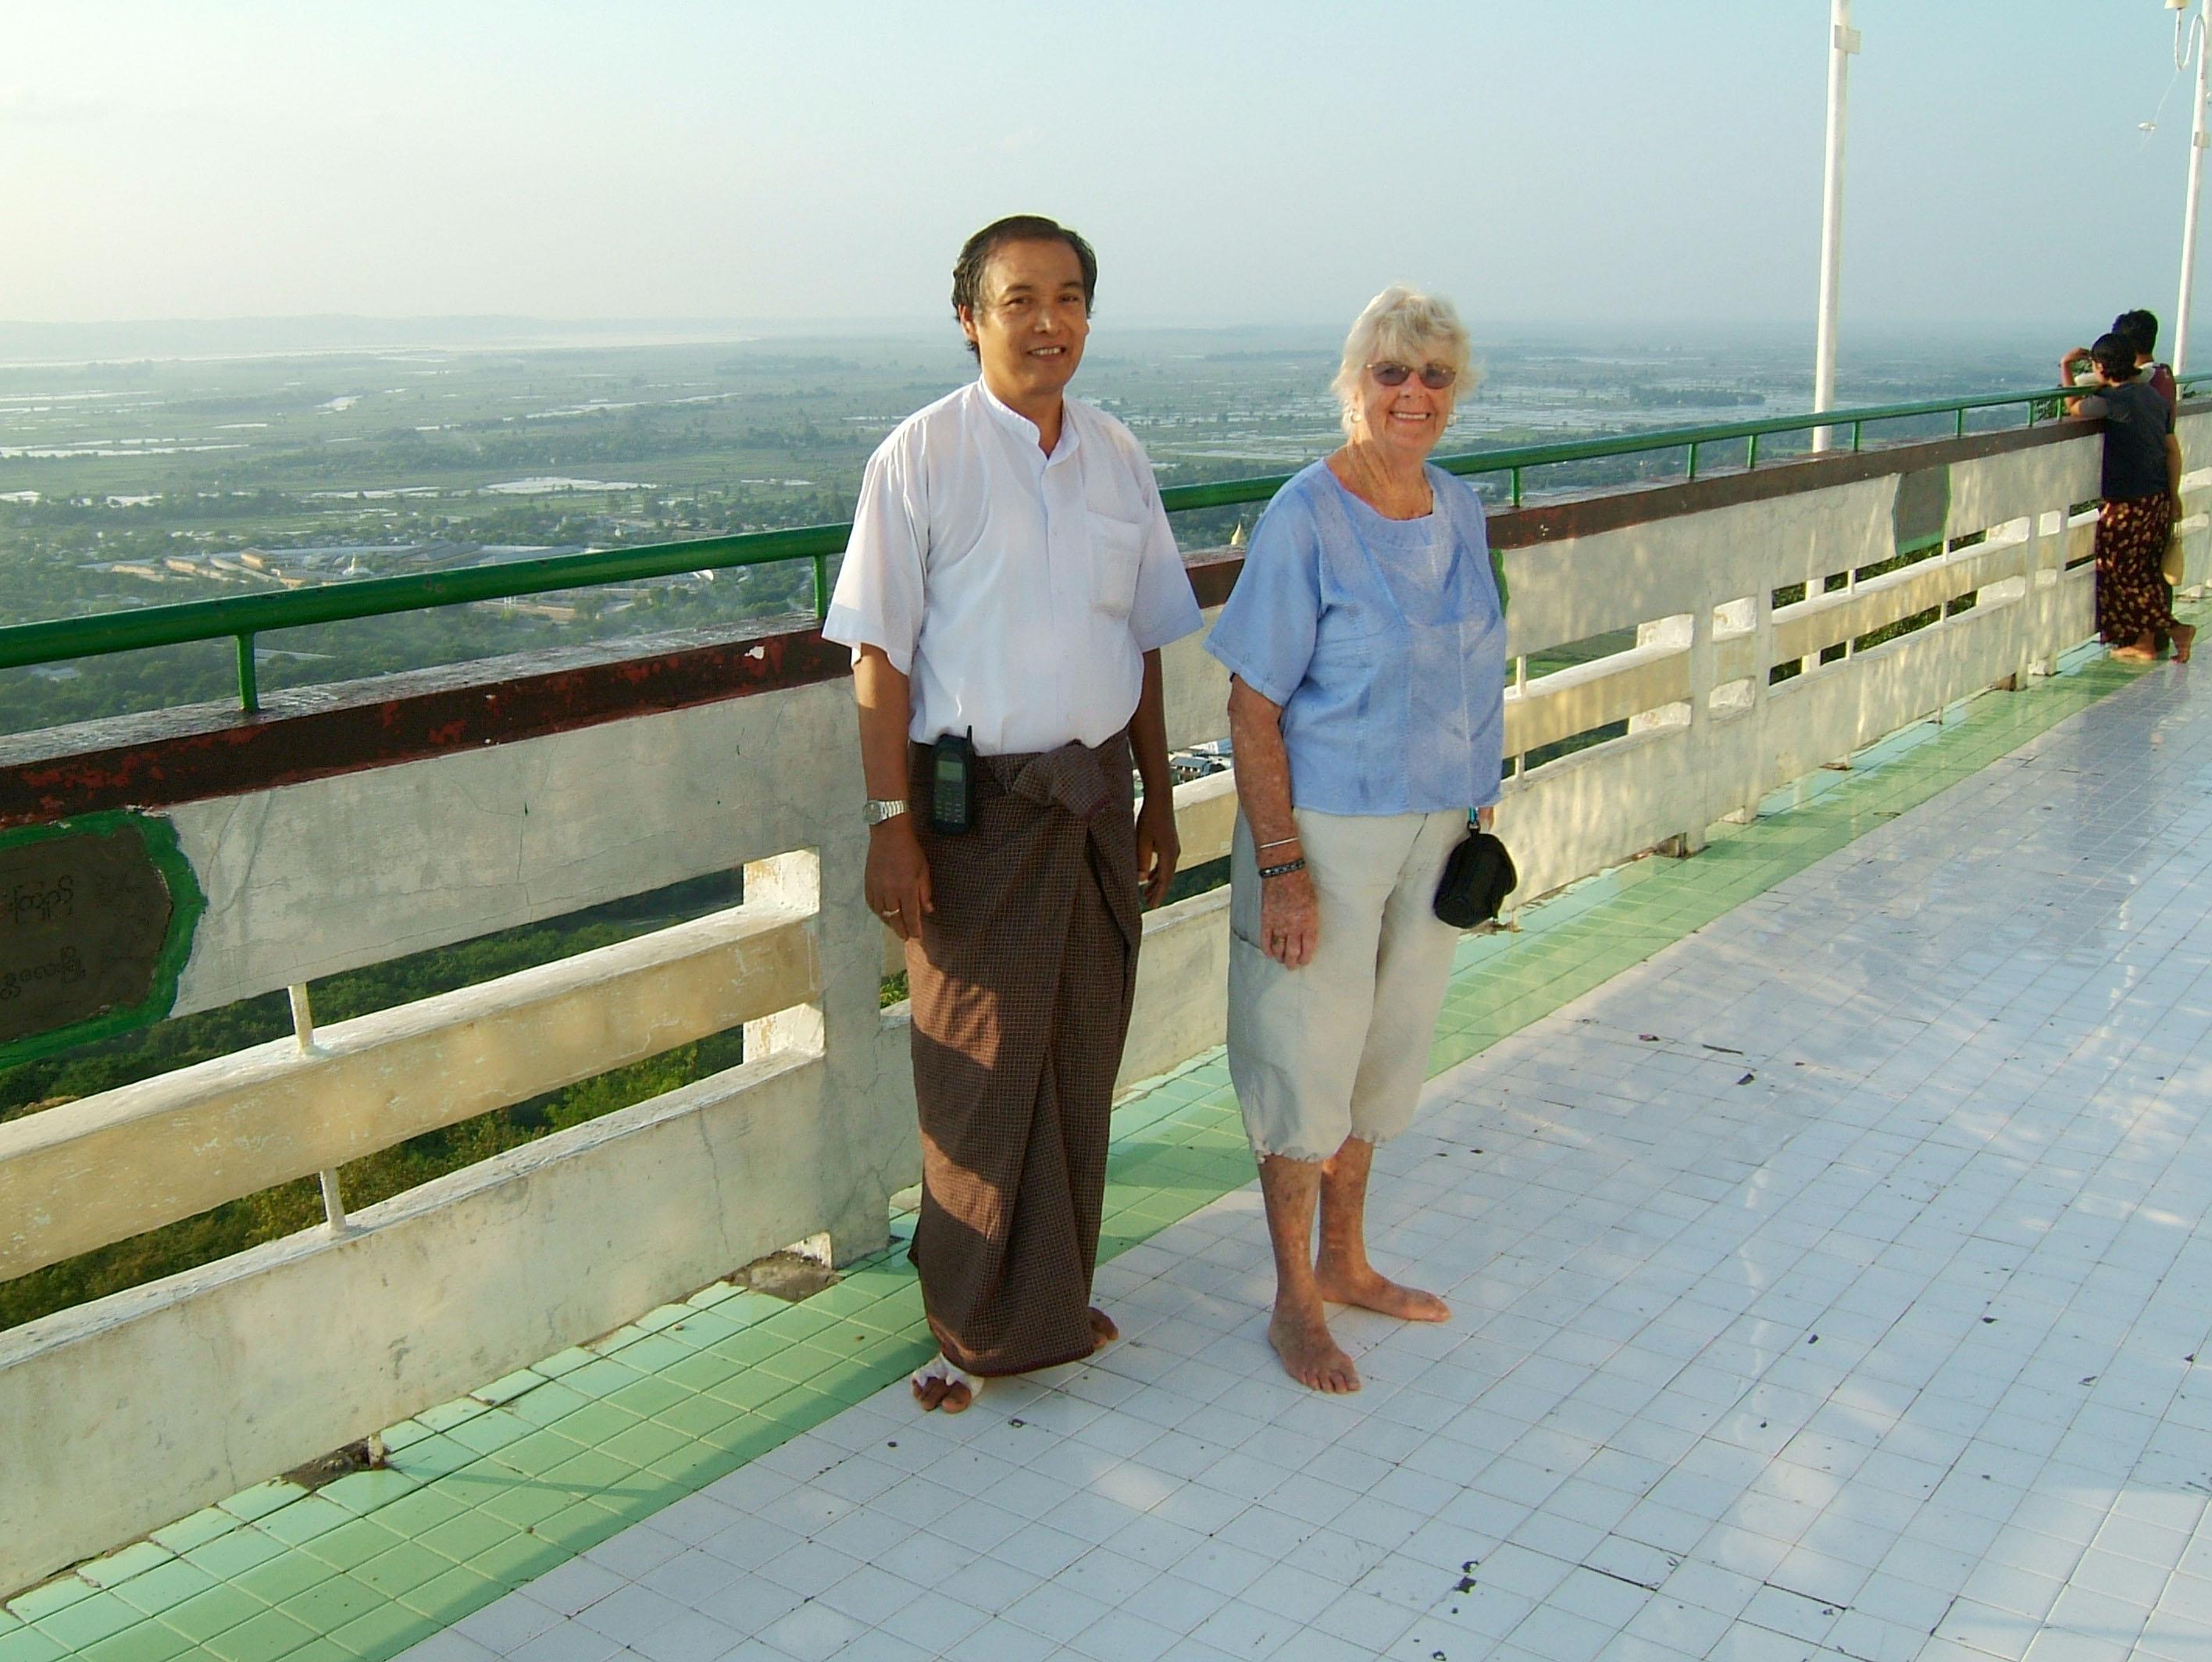 Mandalay Hill Sutaungpyei Pagoda Nov 2004 02